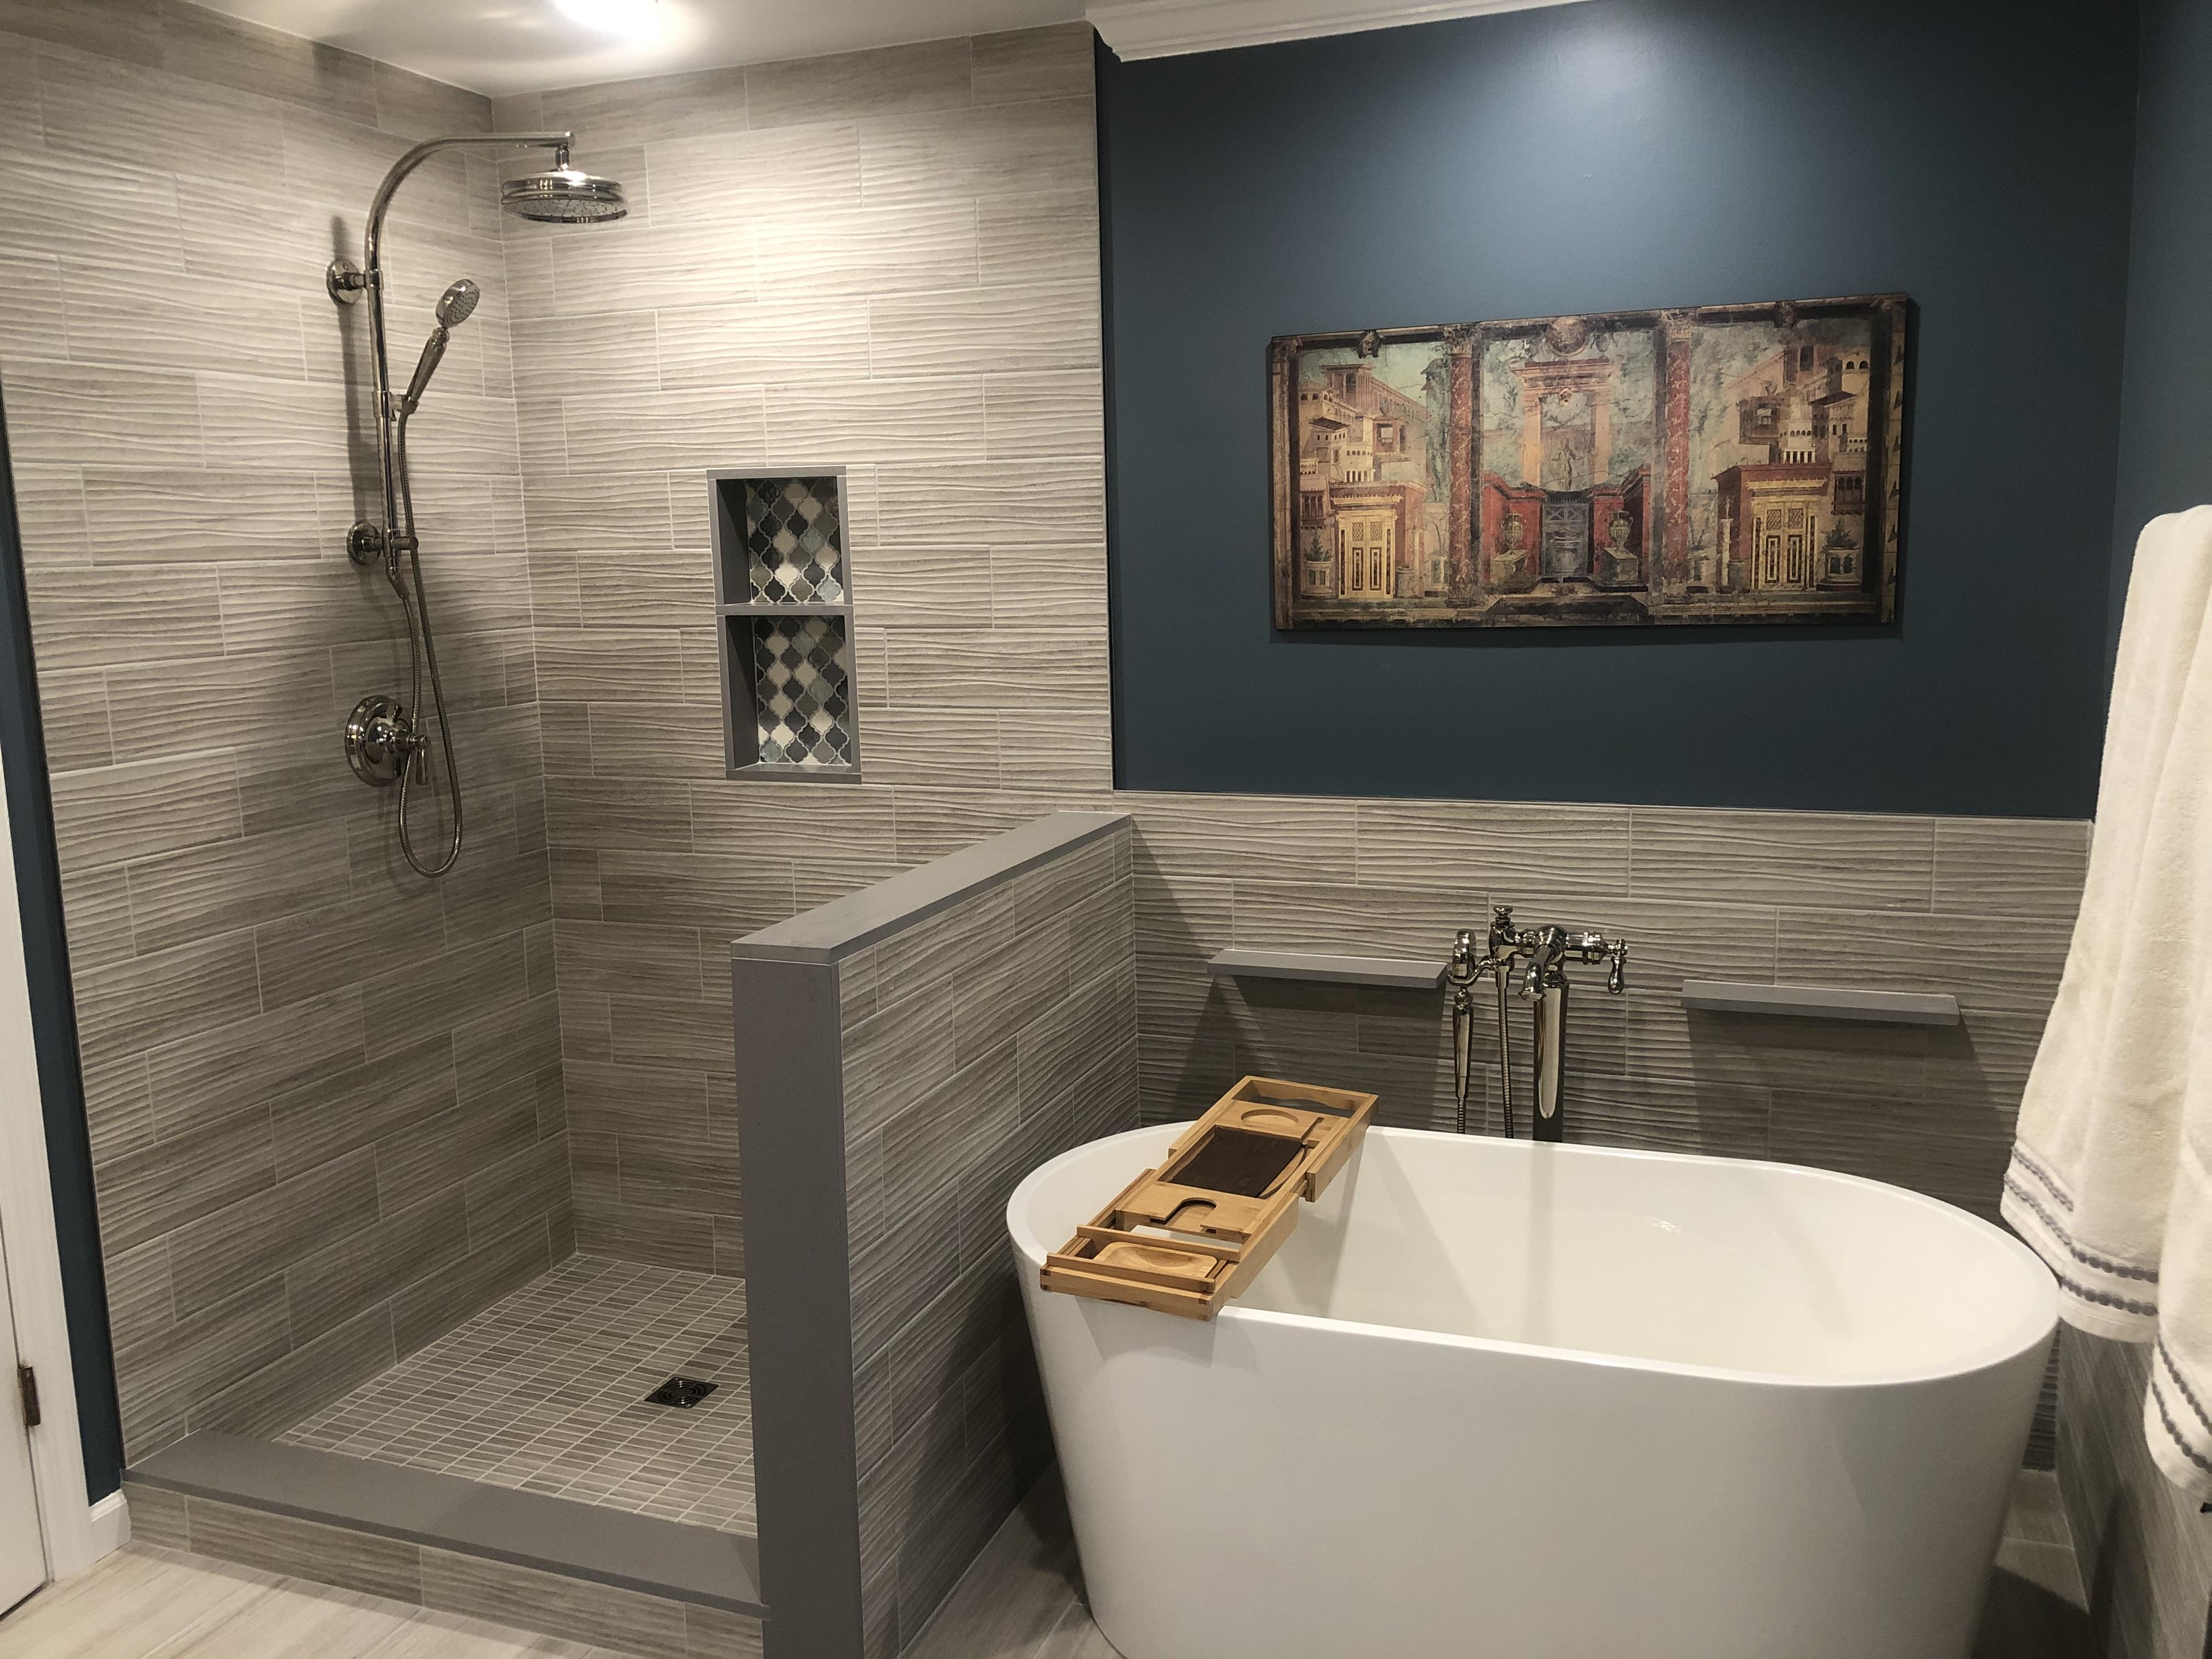 Bathroom - Spa Like